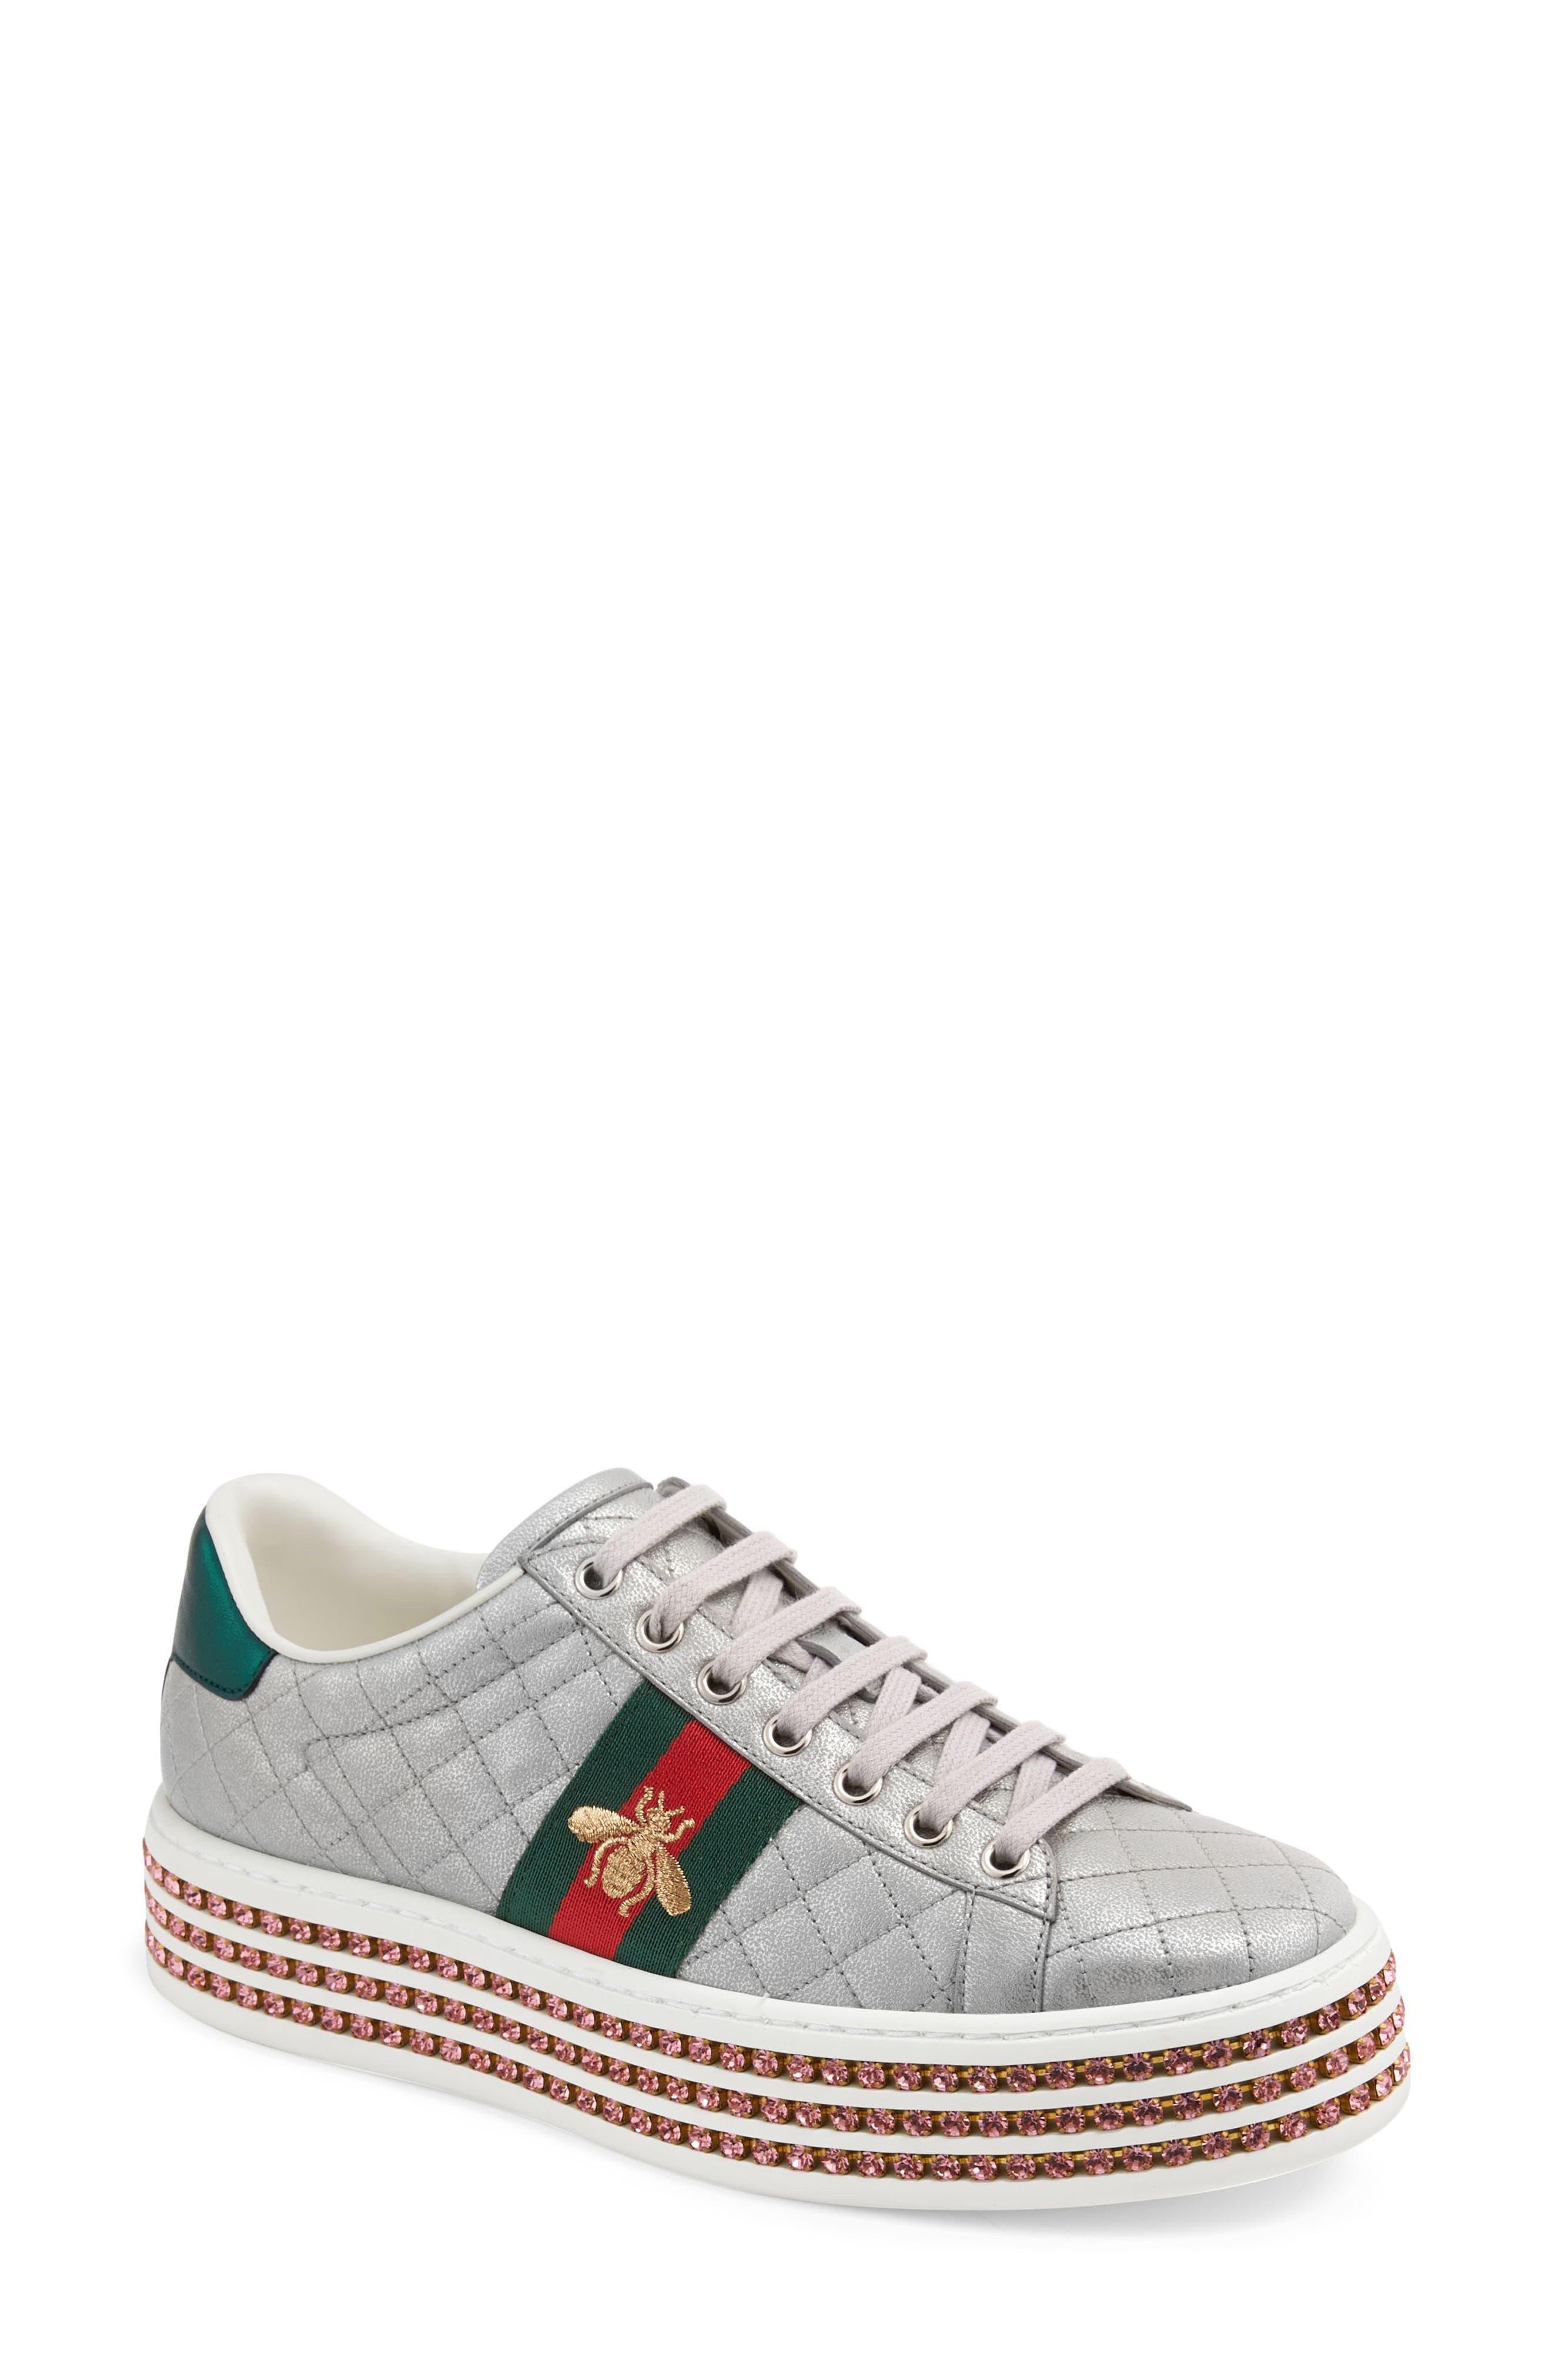 Gucci New Ace Platform Sneaker - Metallic